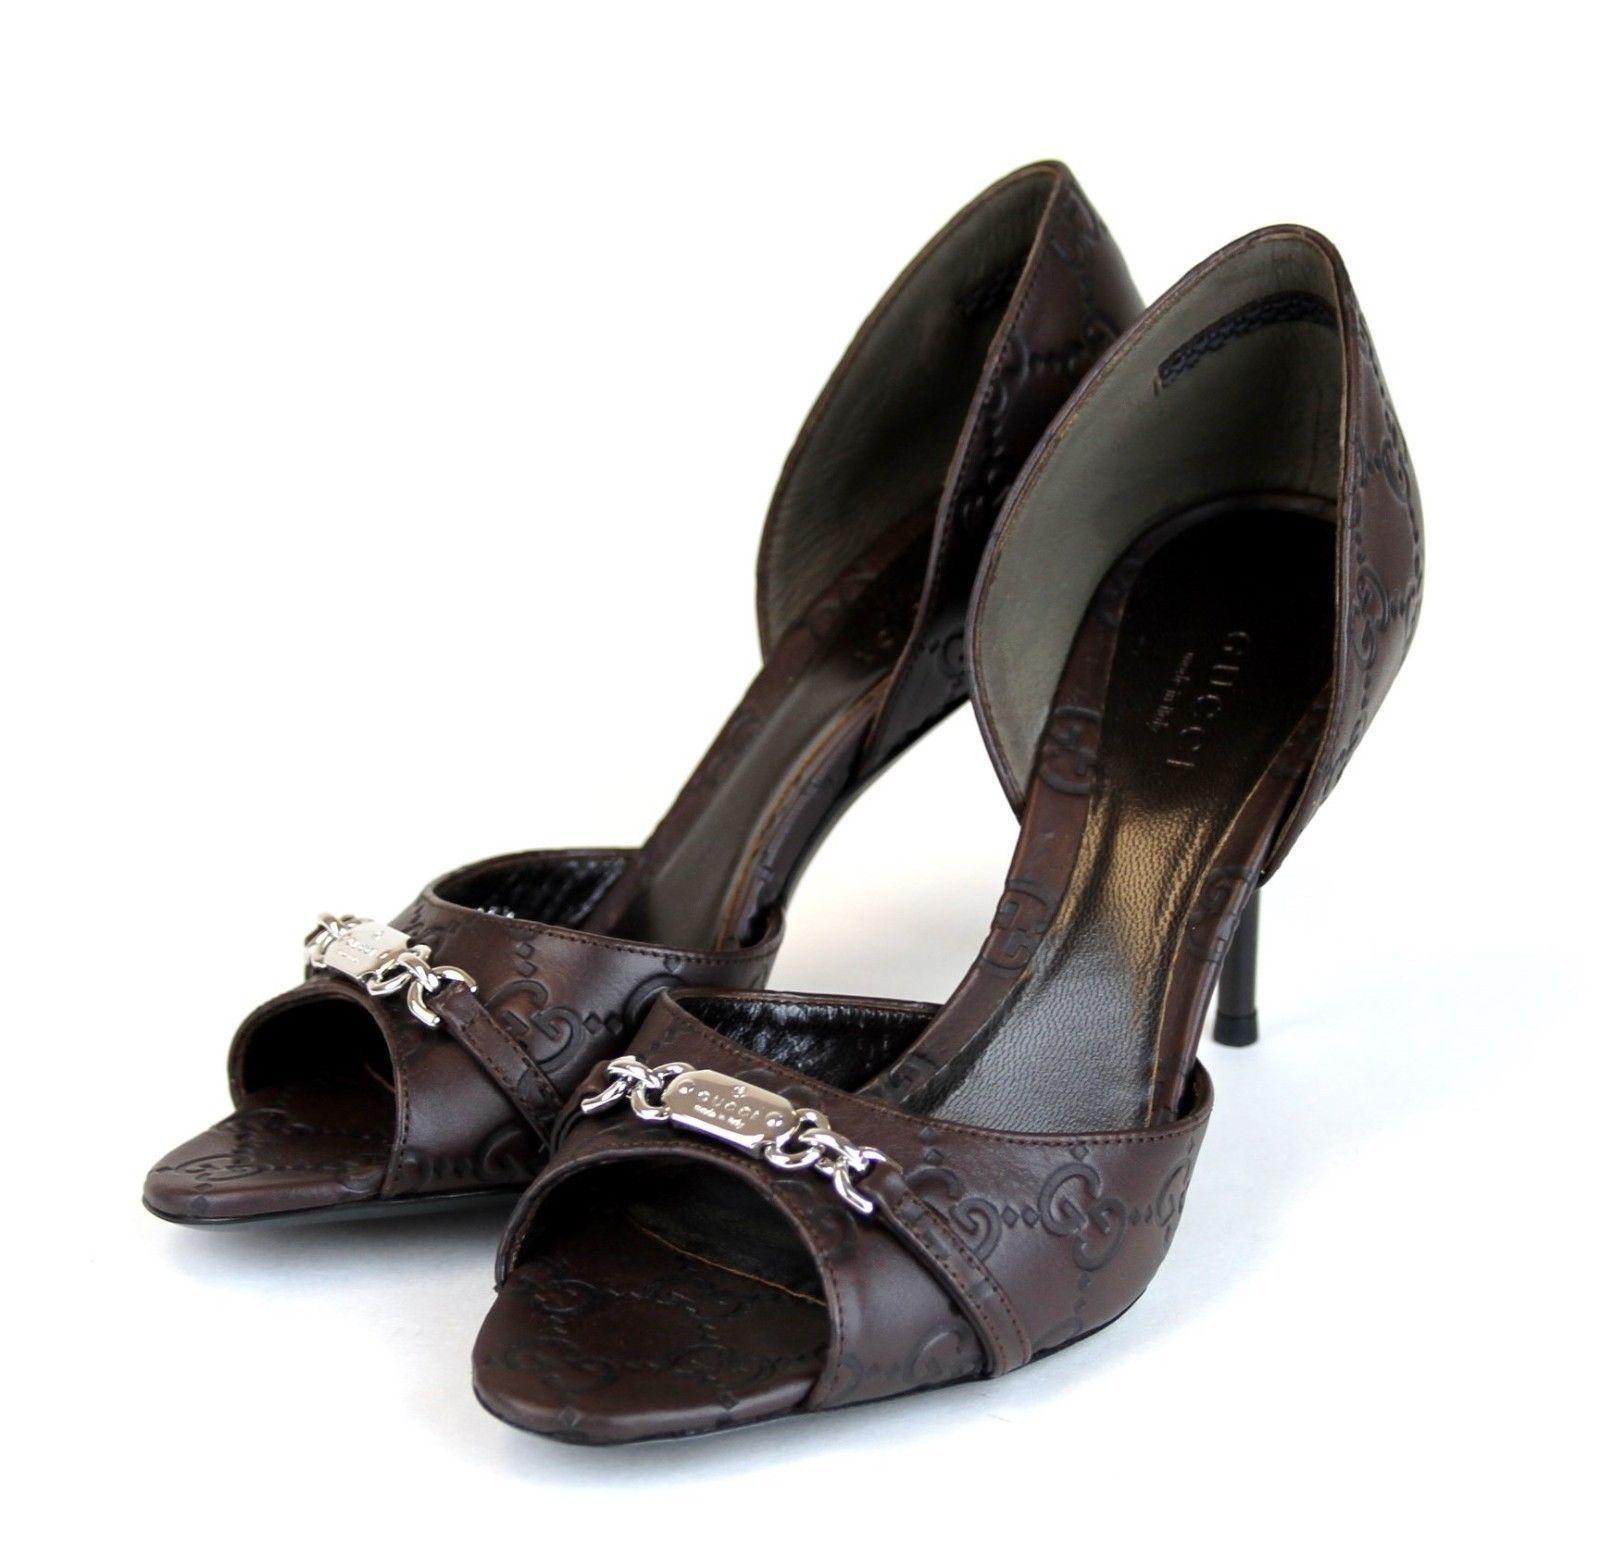 $660  Authentic Gucci Guccissima Leather Open Toe Pump,Chocolate, 317029 2019